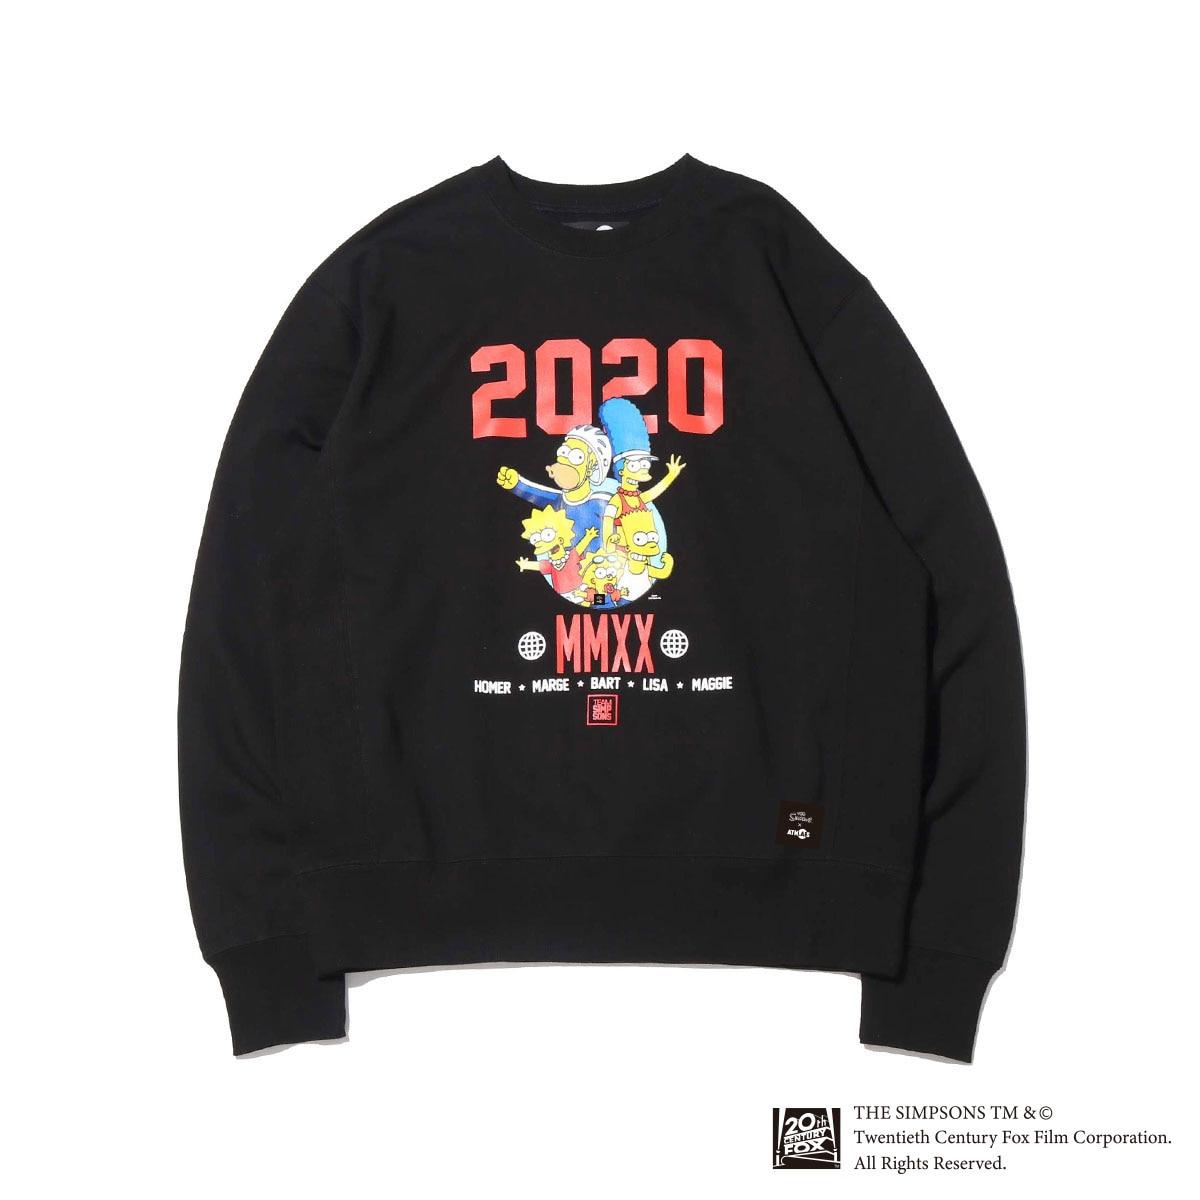 ATMOS LAB x THE SIMPSONS 2020 FAMILY CREW(BLACK)(アトモスラボ ザ シンプソンズ 2020 ファミリー クルー)【メンズ】【スウェット】【20SP-S】